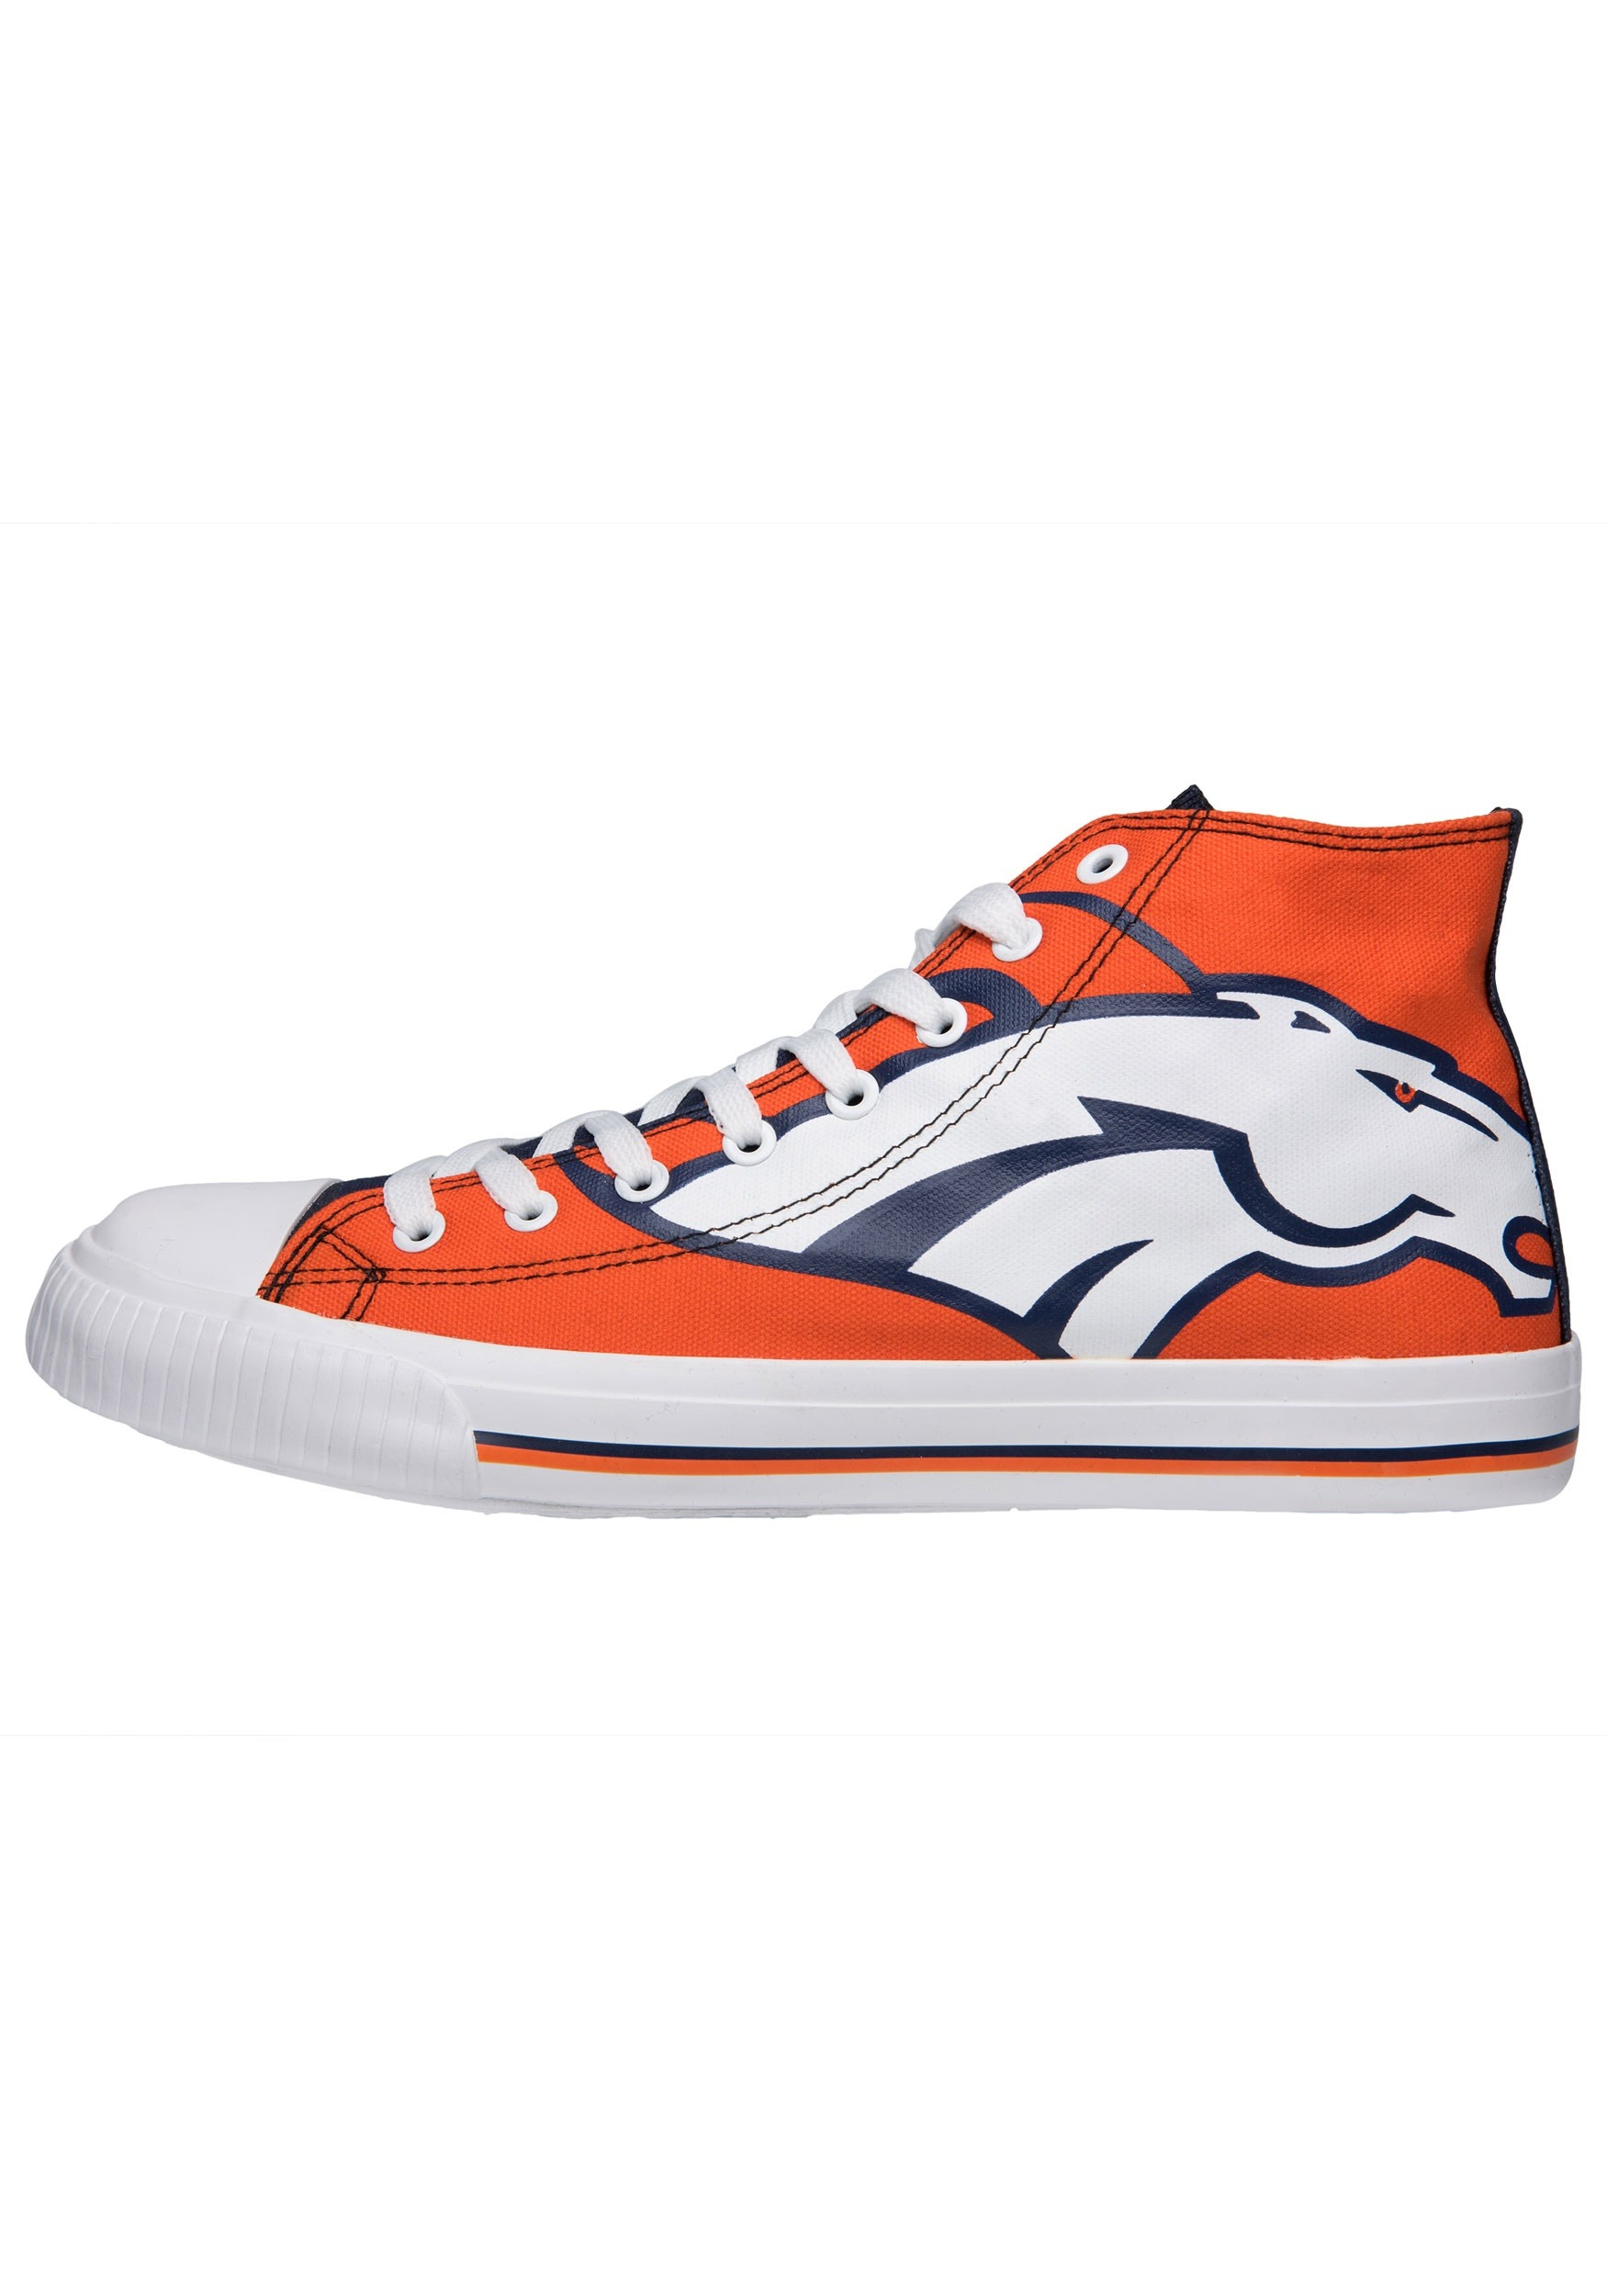 Denver Broncos High Top Big Logo Canvas Shoes for Men